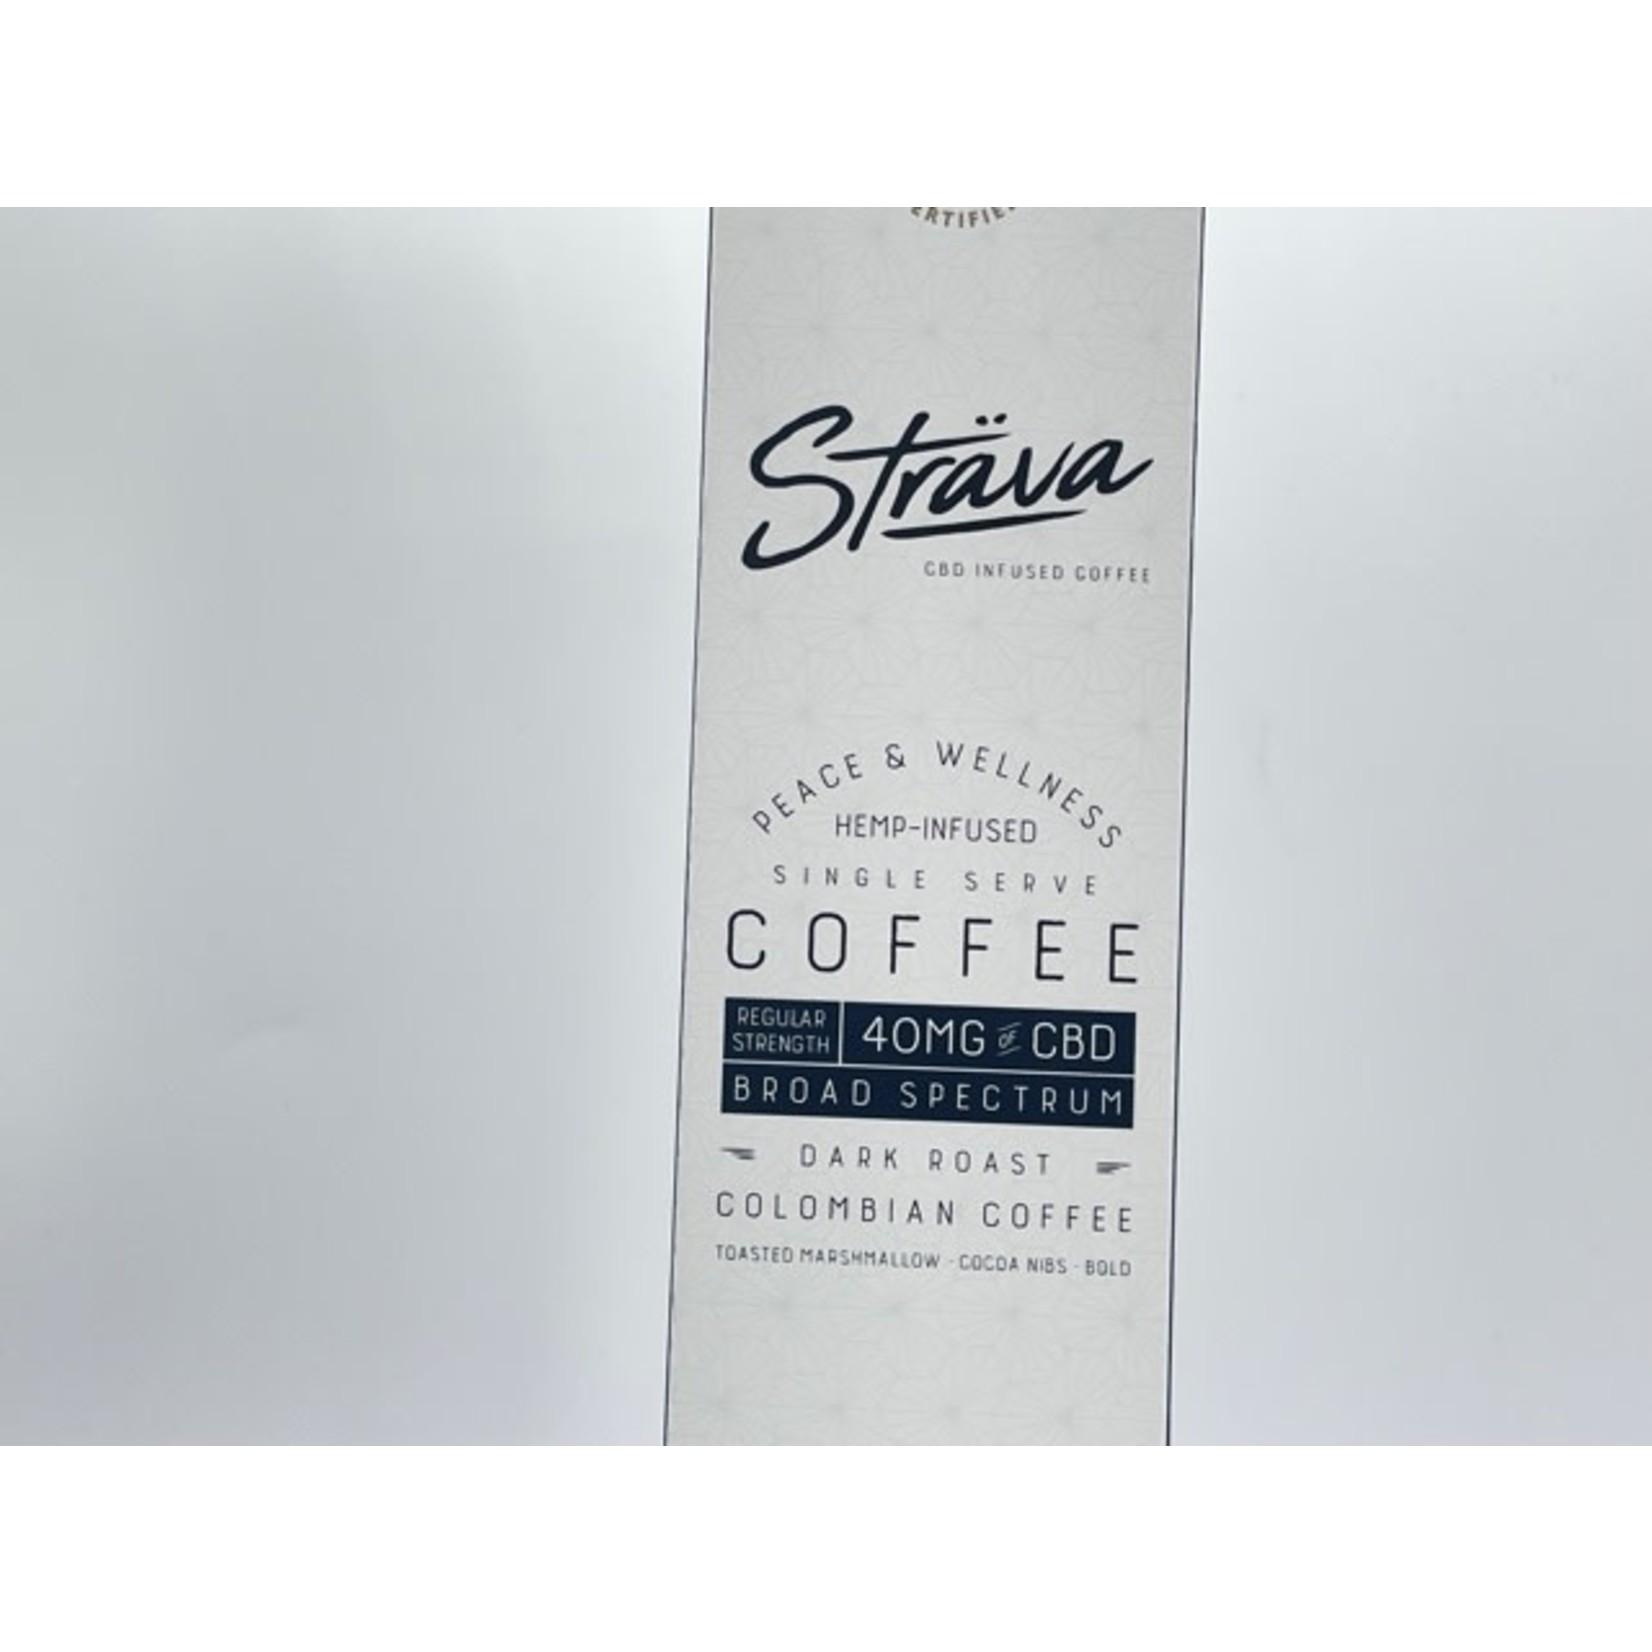 Strava Strava CBD infused Coffee 40mg Broad Spectrum Dark Roast Regular Strength Single Serve  Keurig Cup